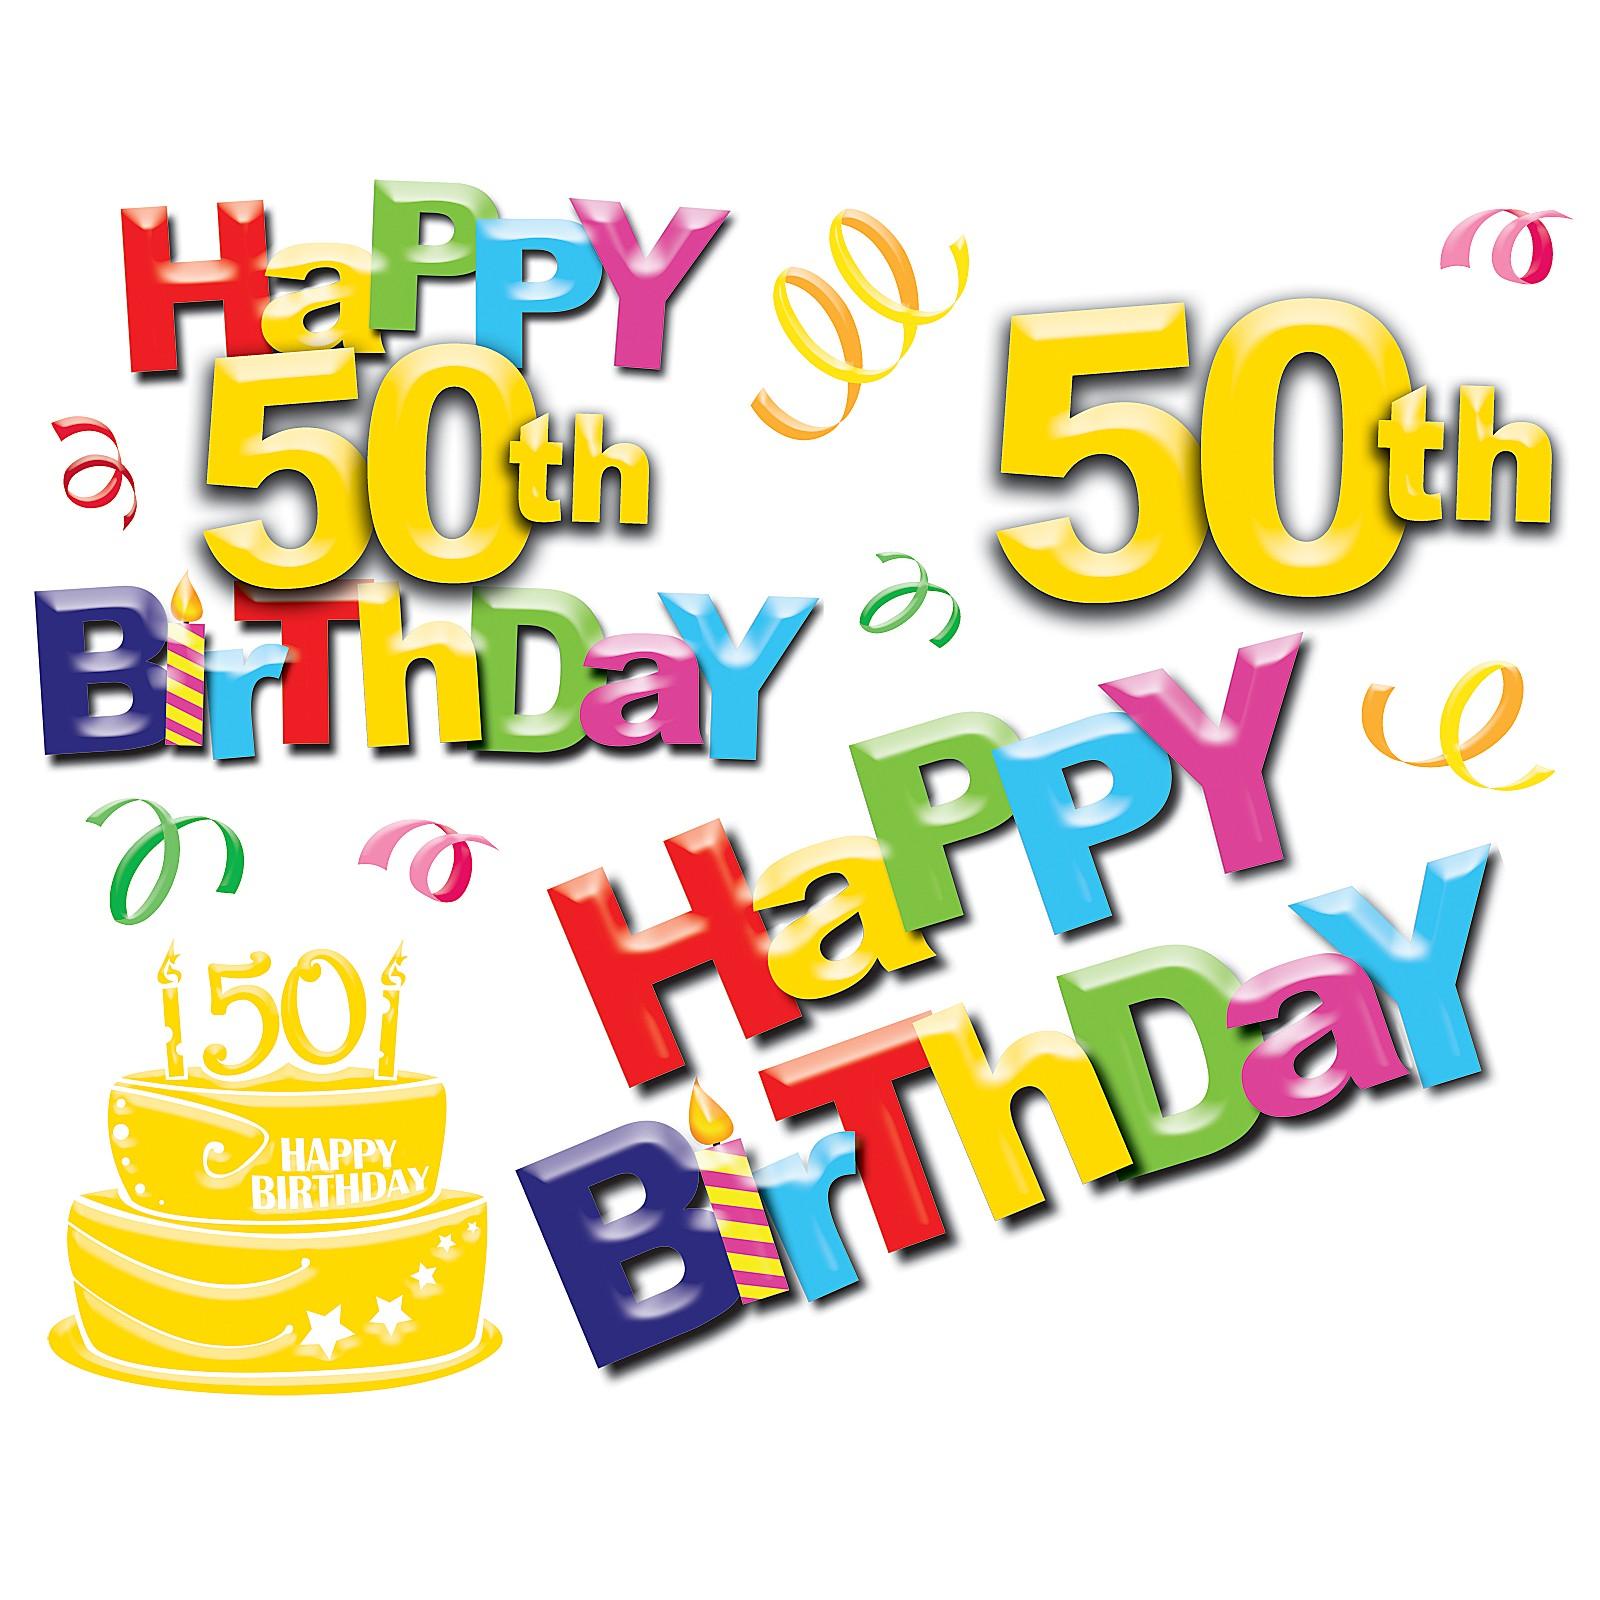 bdyc is 50 today     u2013 berri district youth club